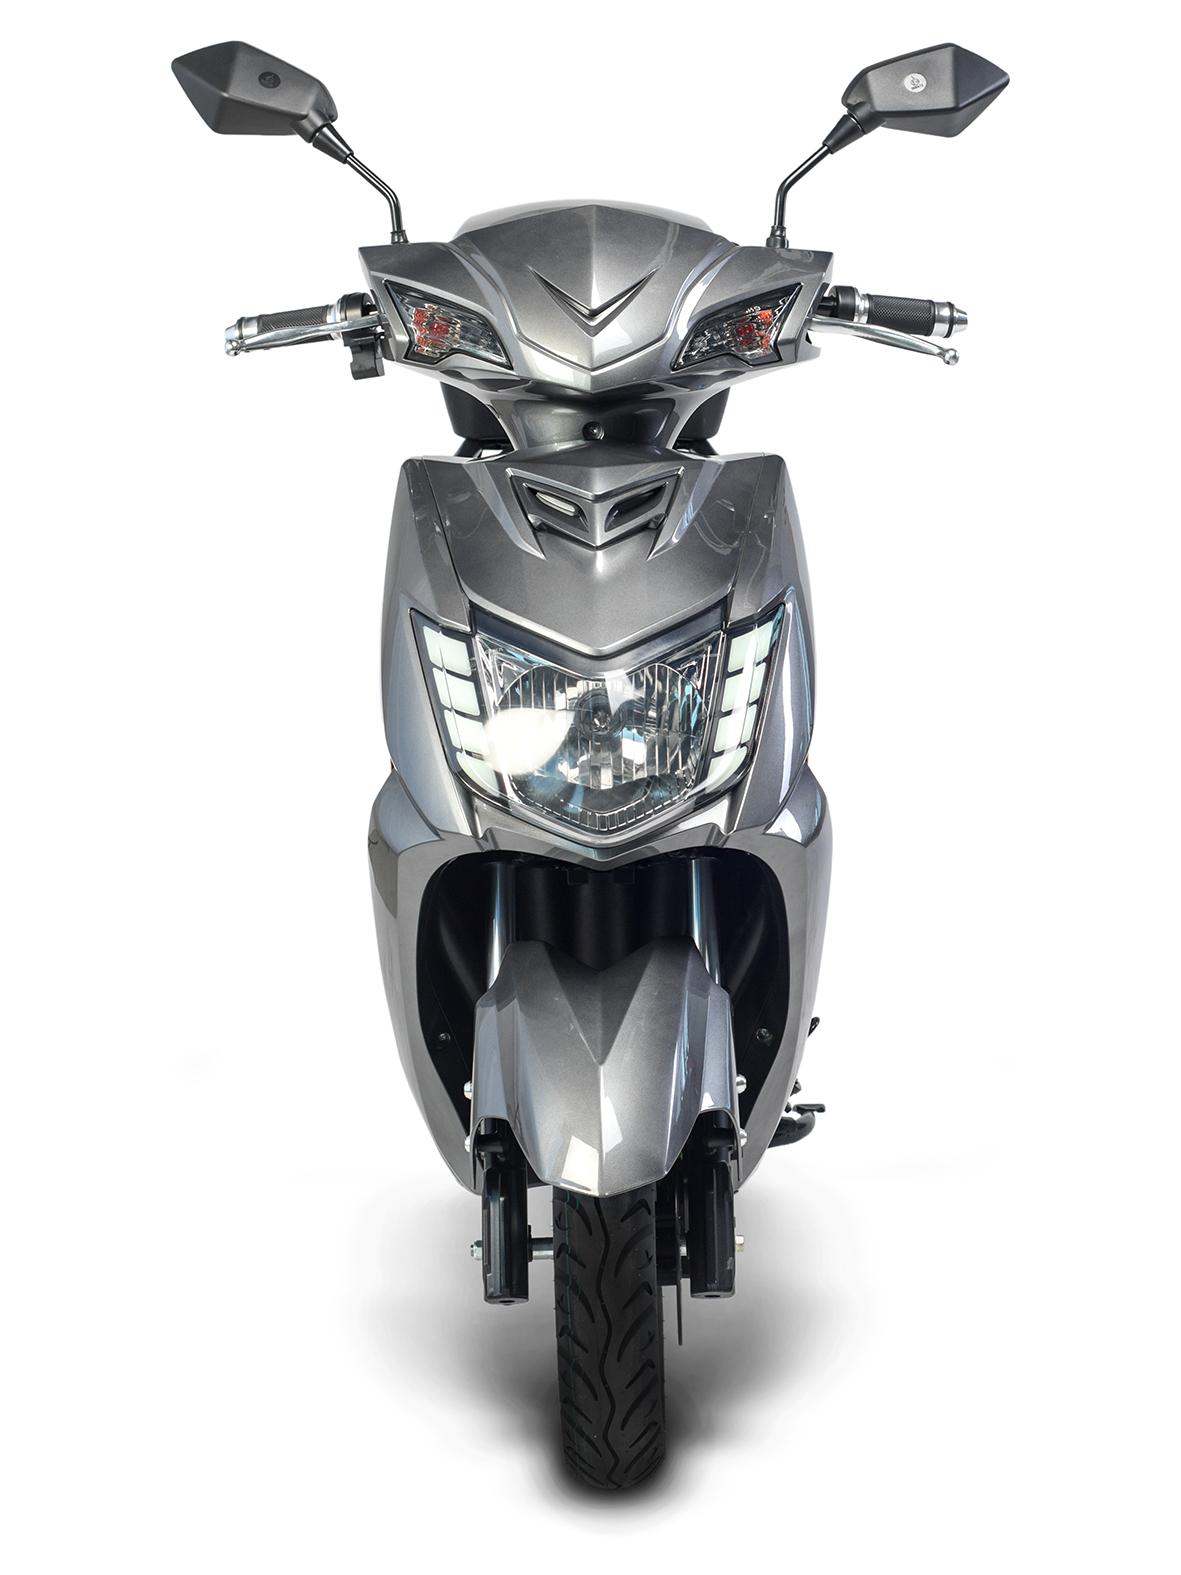 Elektroroller, E- Roller, Motorroller Siegurd1 grau 1600Watt Bild 6